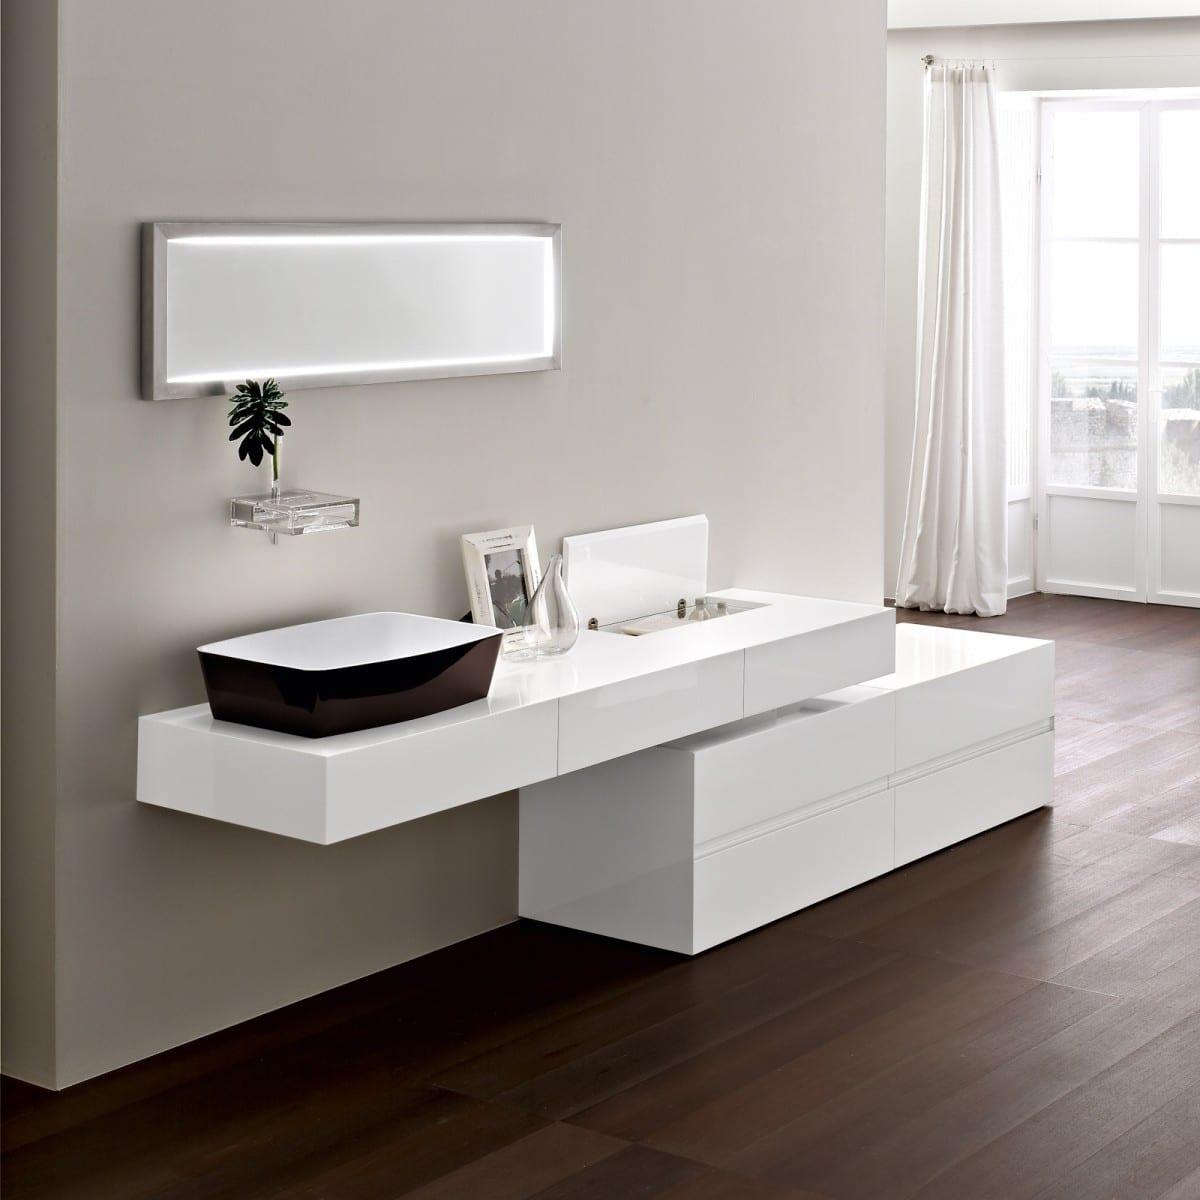 Muebles Modernos Para Great Kit De Muebles Modernos Para Casa  # Muebles Lujosos Y Modernos